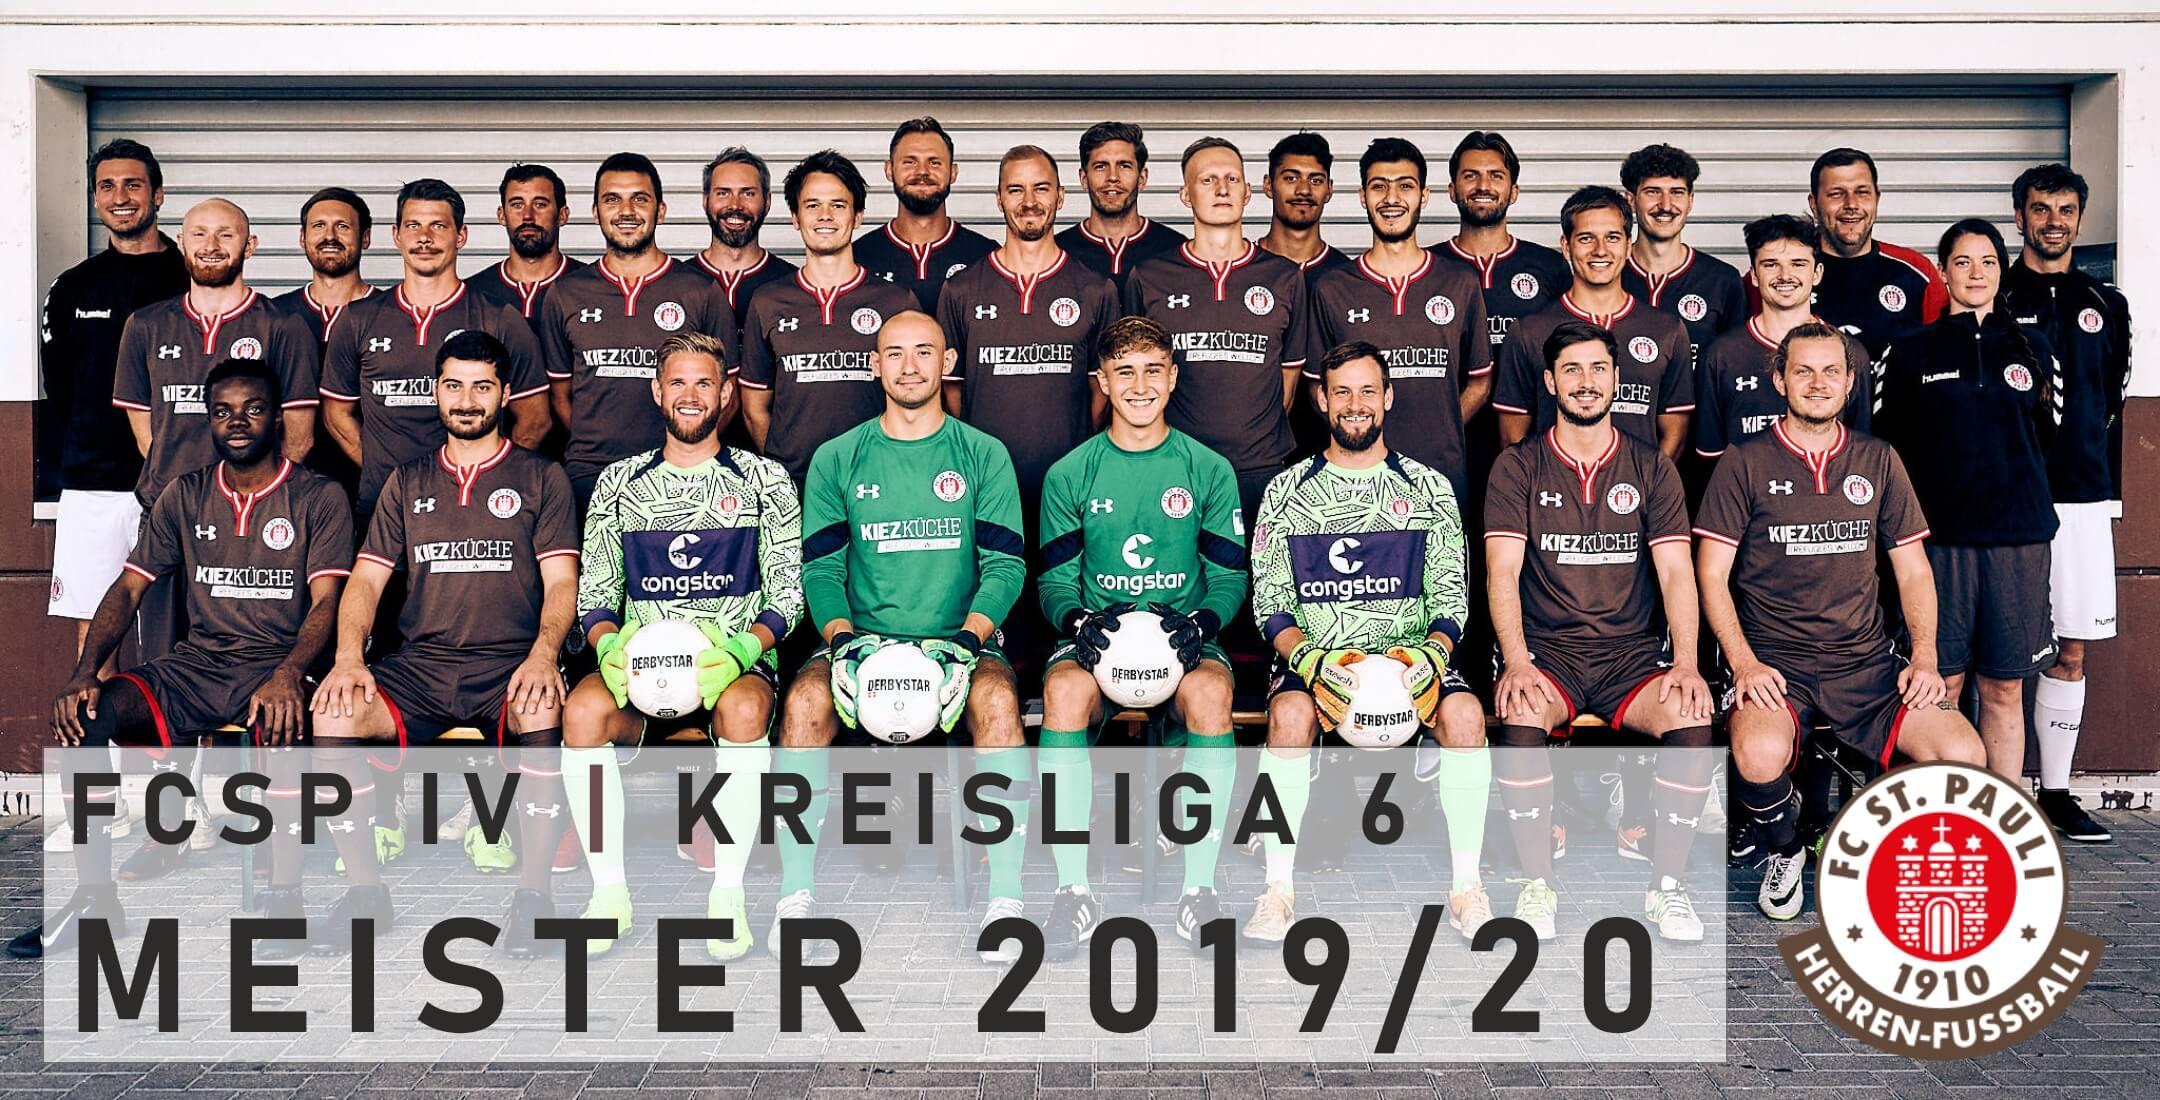 FCSP IV ist Meister der Kreisliga 6